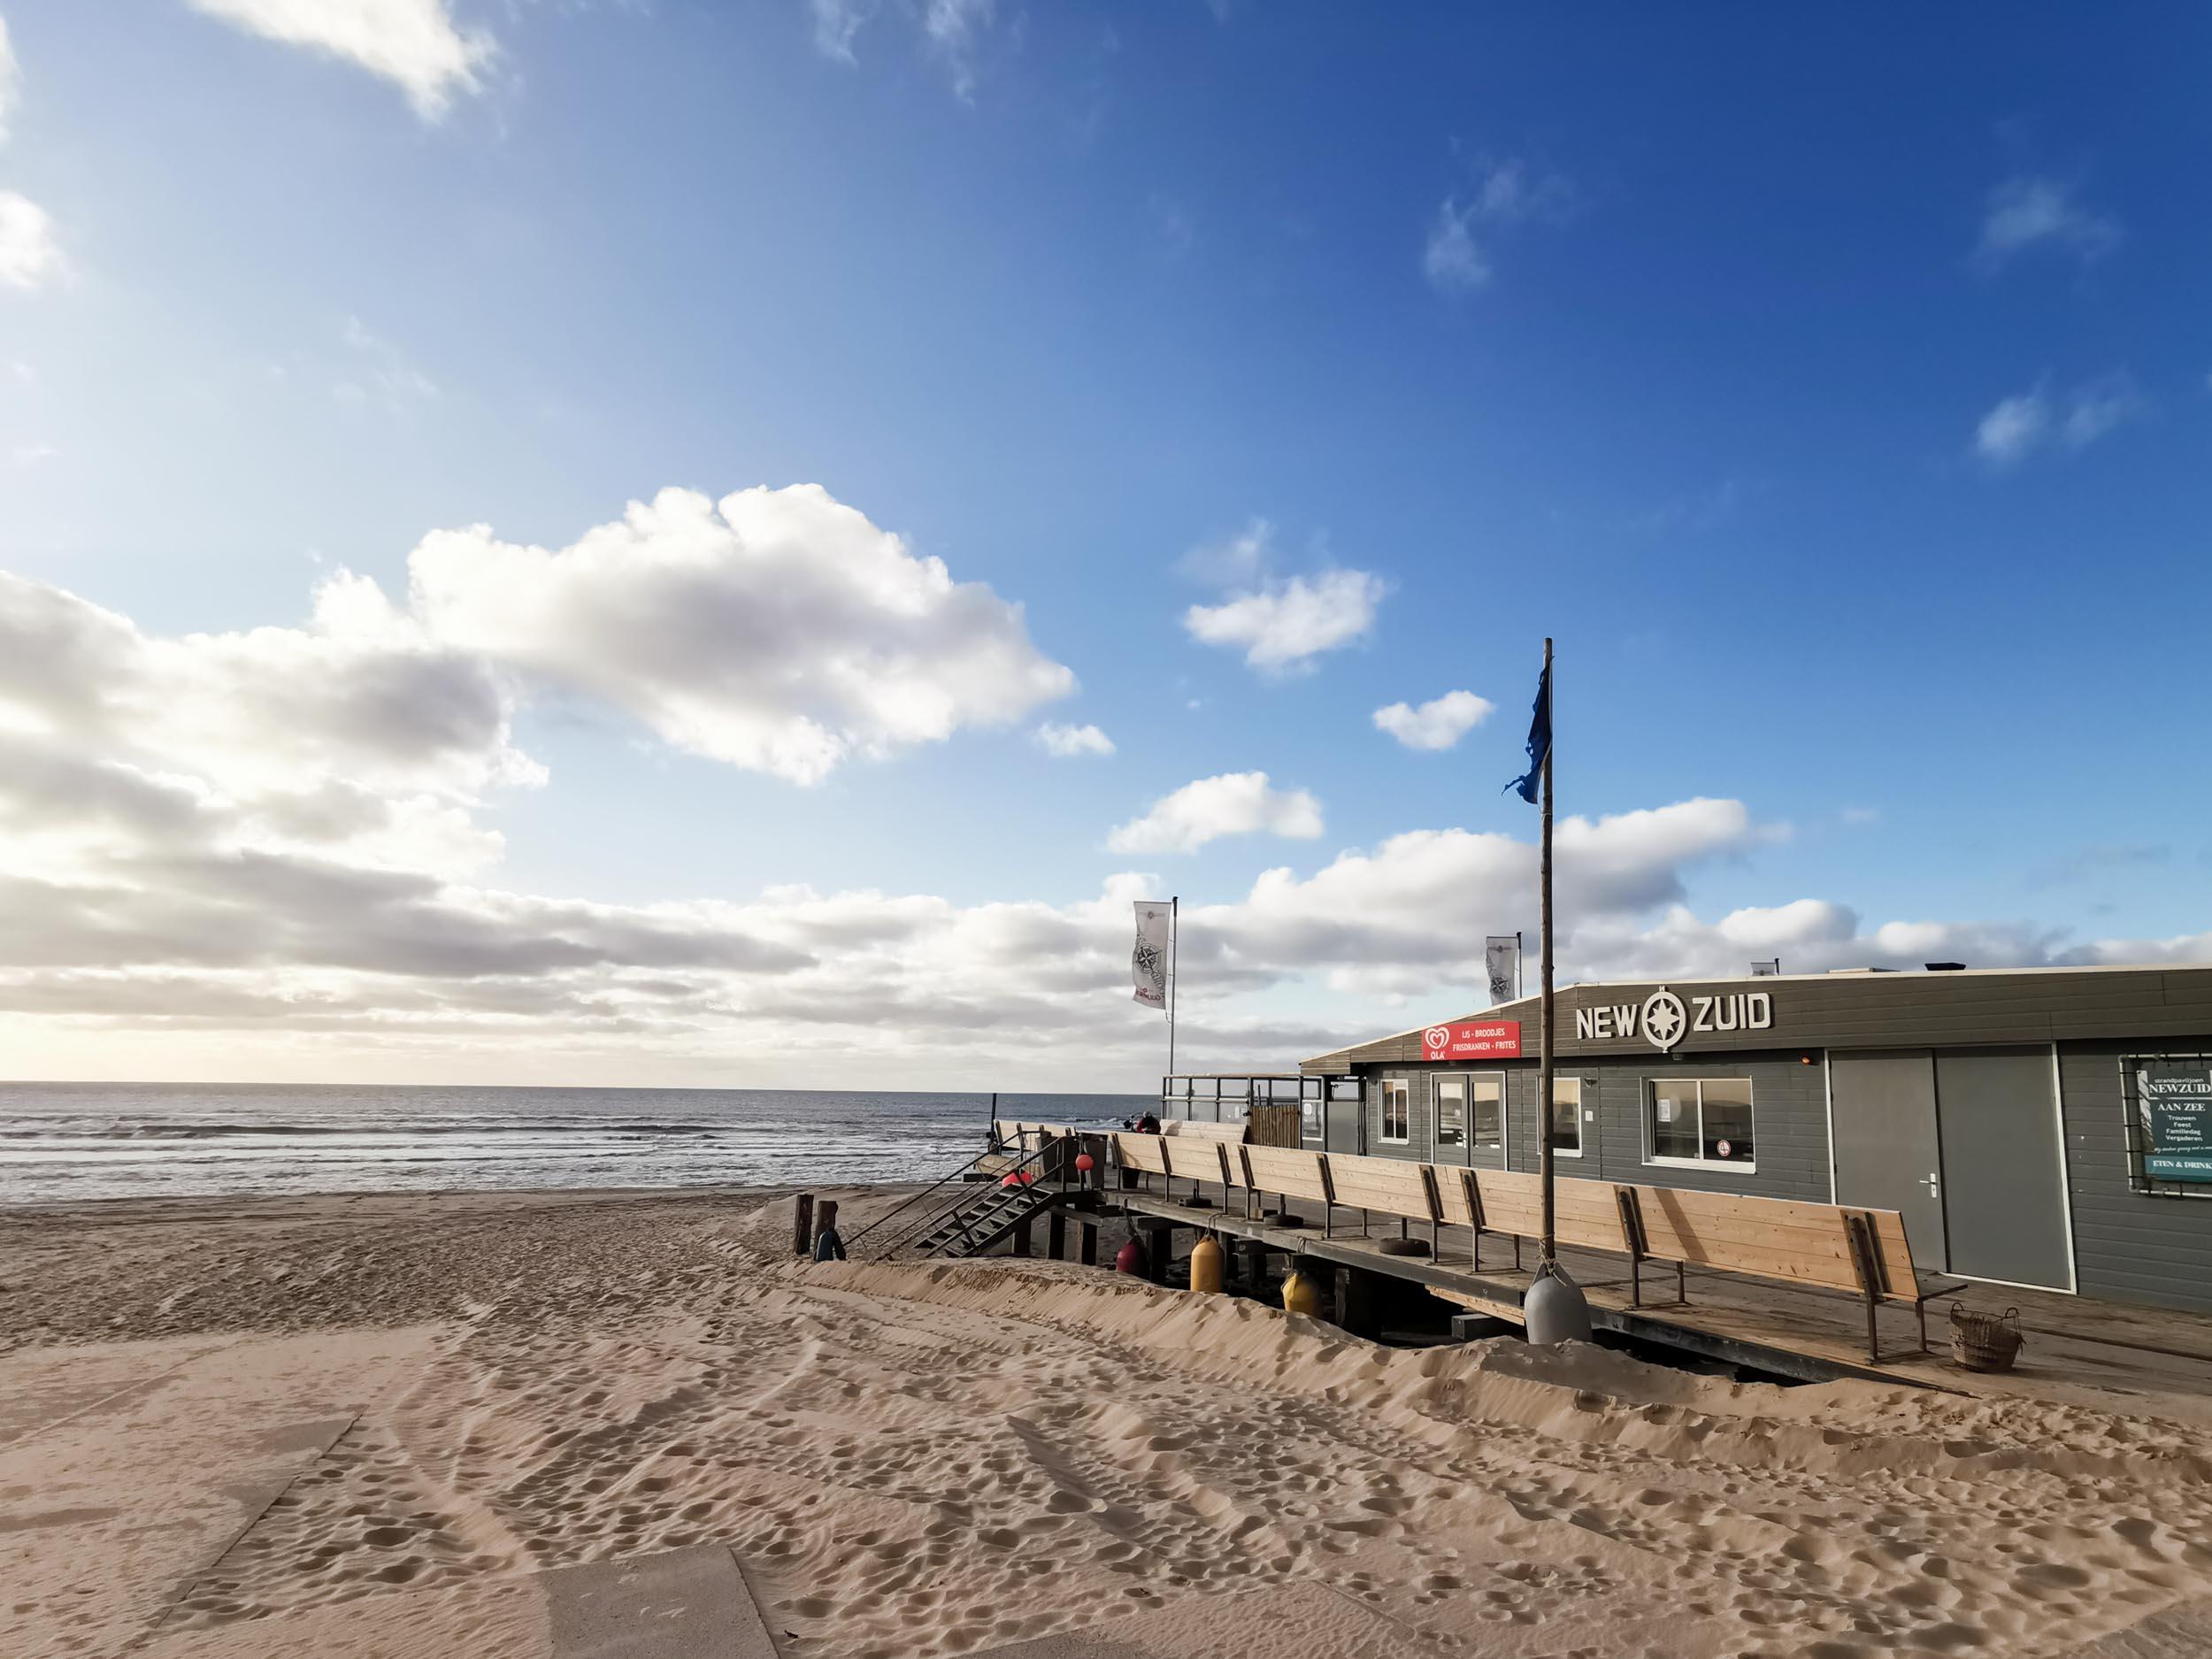 Strandpavillon New Zuid